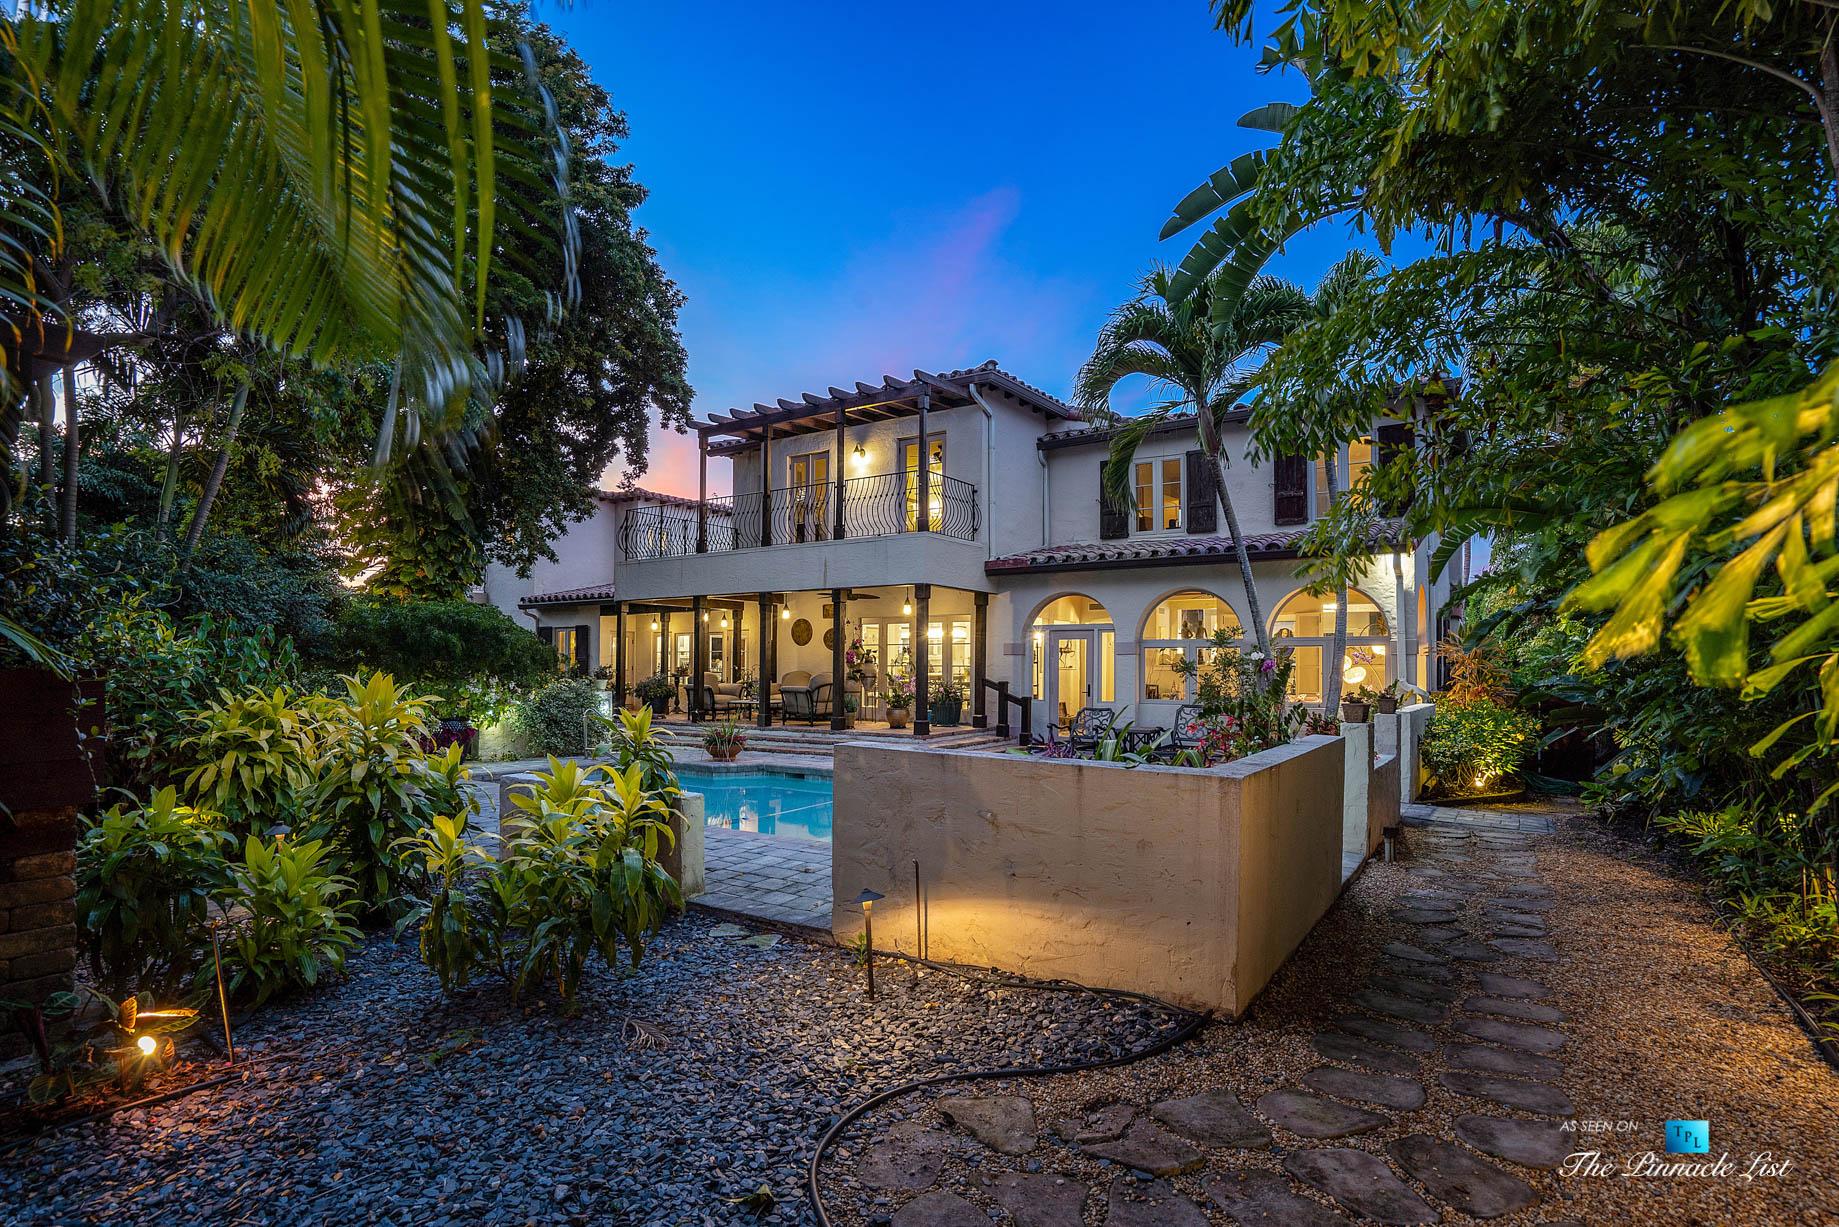 888 Oleander St, Boca Raton, FL, USA - Luxury Real Estate - Old Floresta Estate Home - Sunset Backyard View